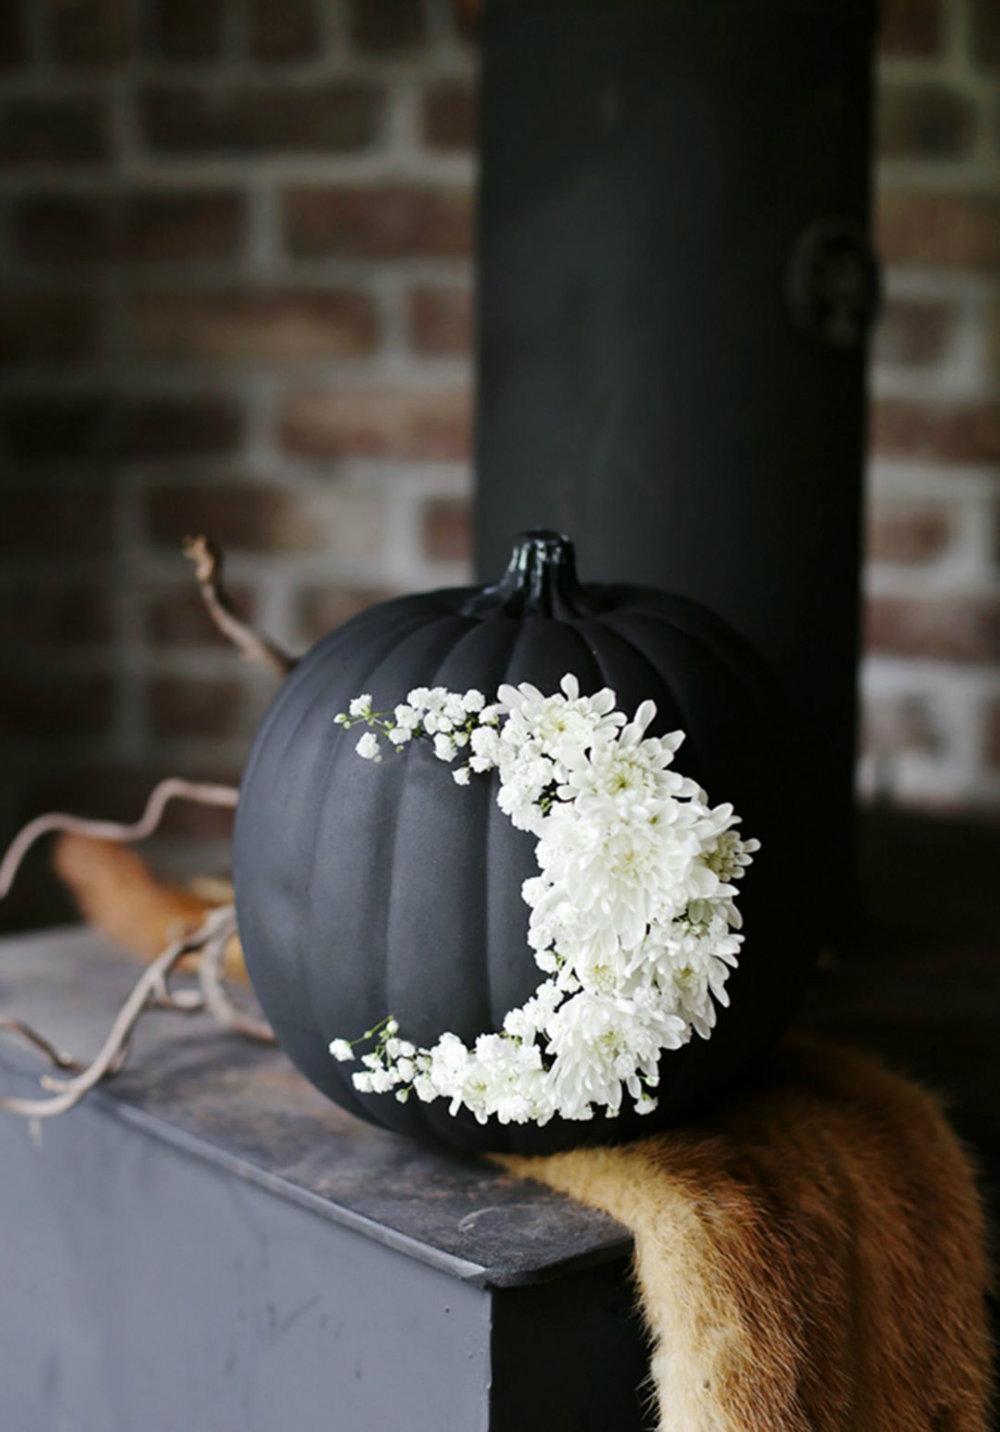 The Best Elegant Halloween Décor Ideas 04 Halloween Décor Ideas The Best Elegant Halloween Décor Ideas The Best Elegant Halloween D  cor Ideas 04